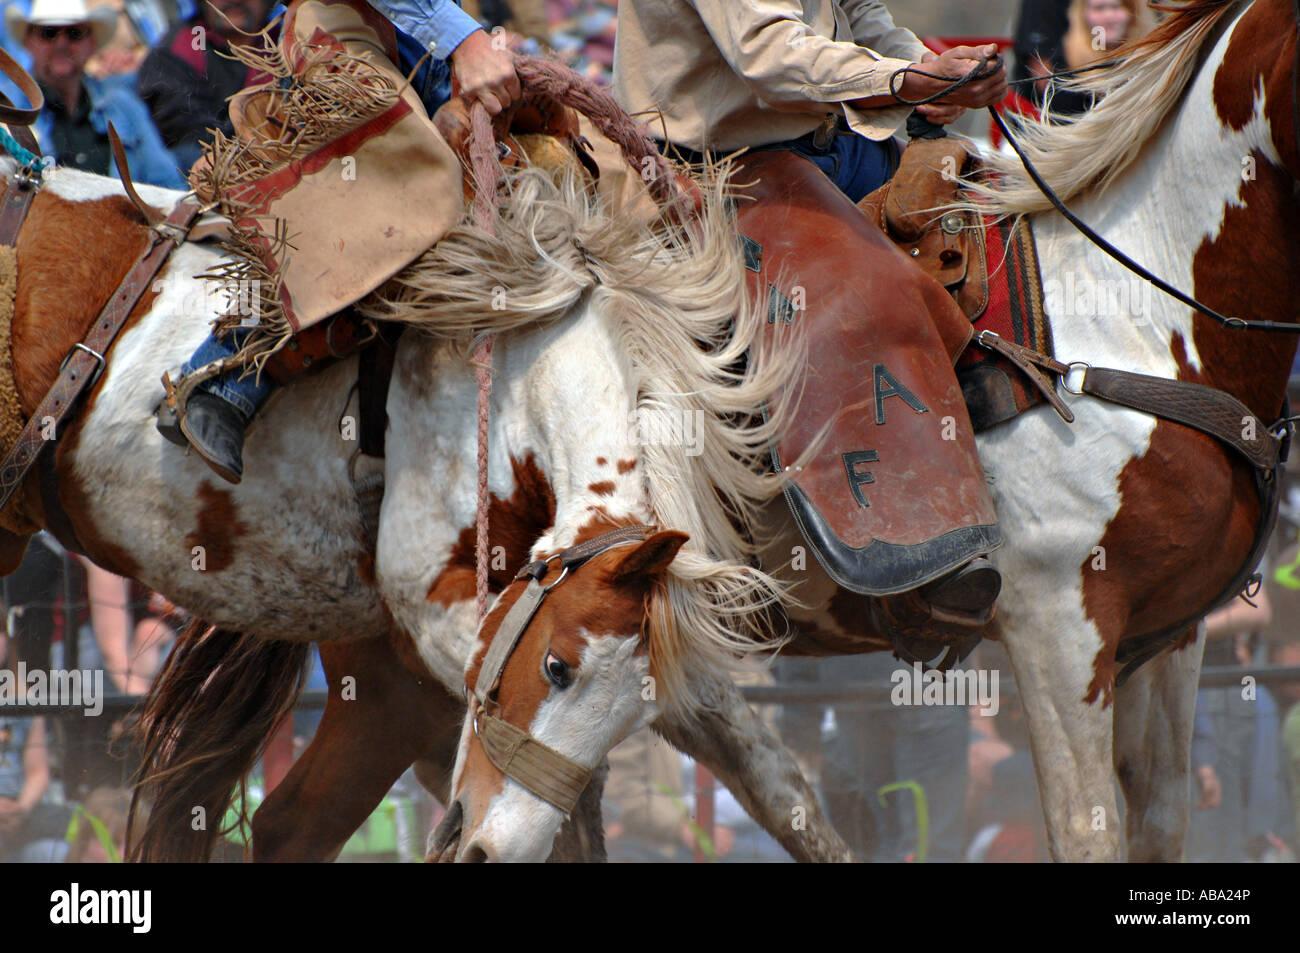 A Saddle Bronc Bucking - Stock Image